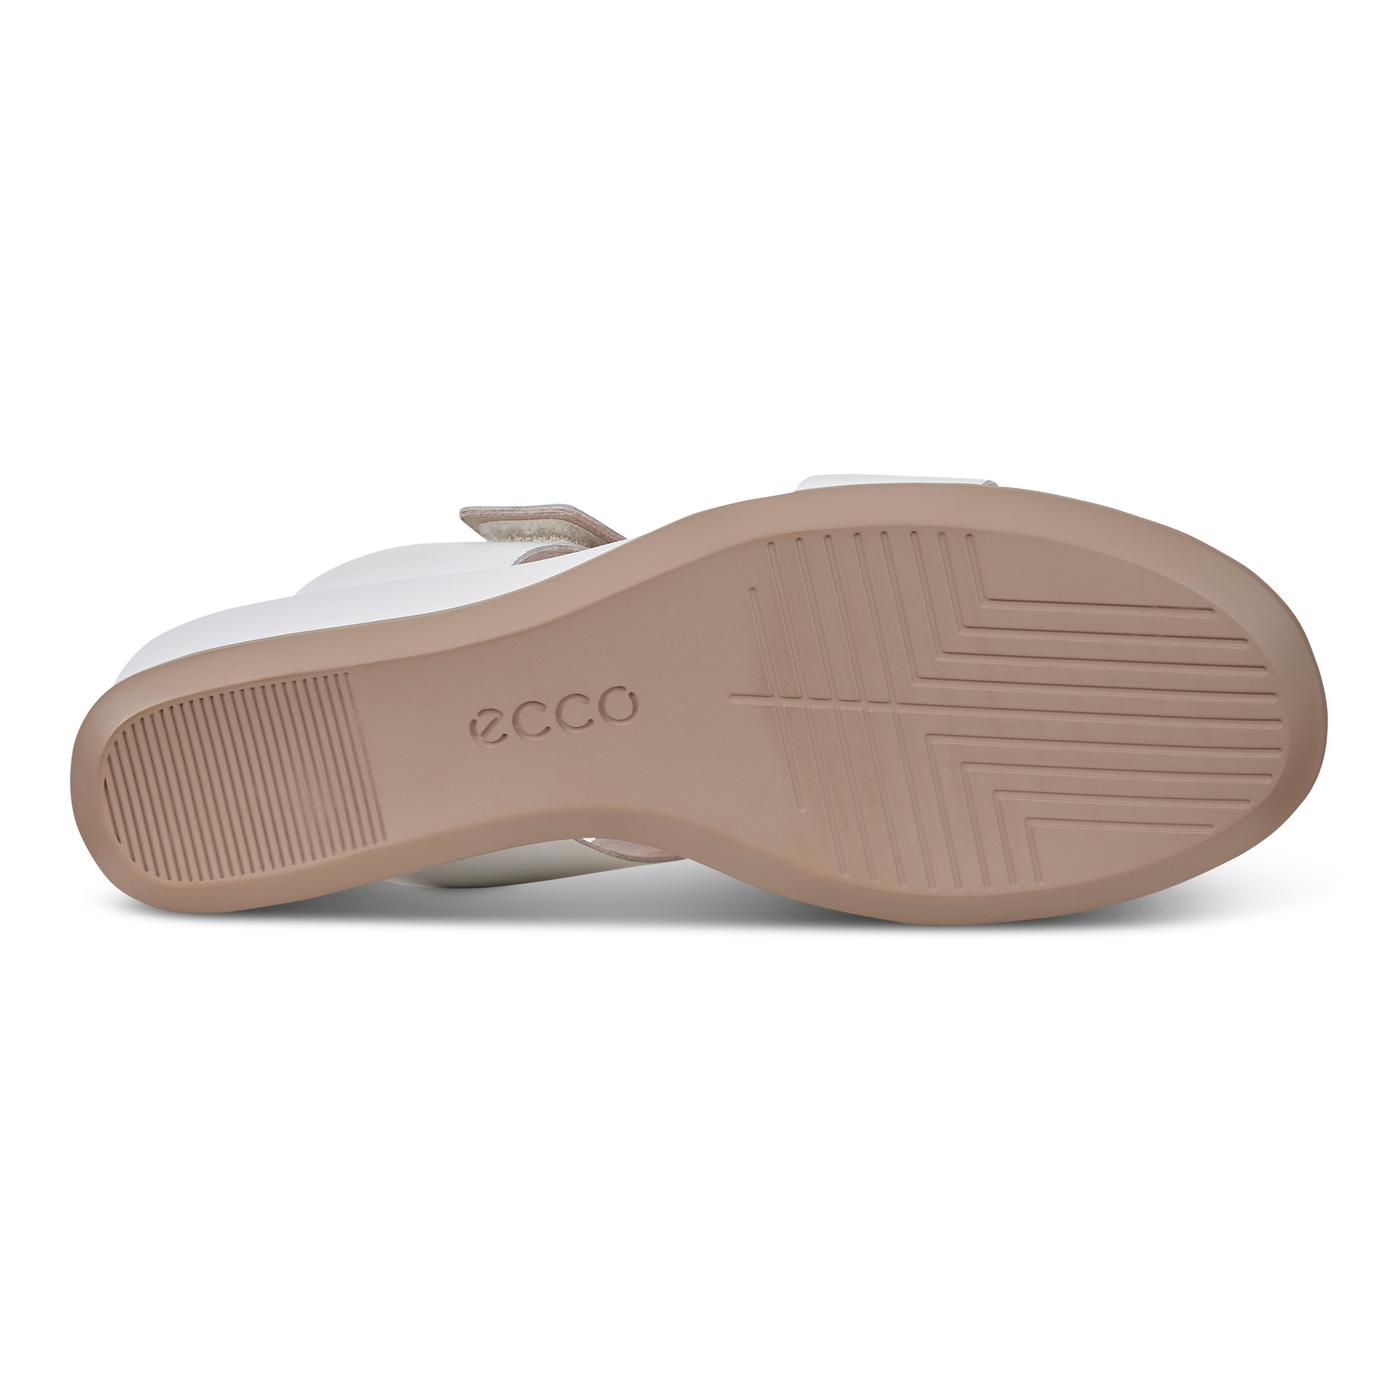 ECCO Shape 35 Wedge 2-Strap